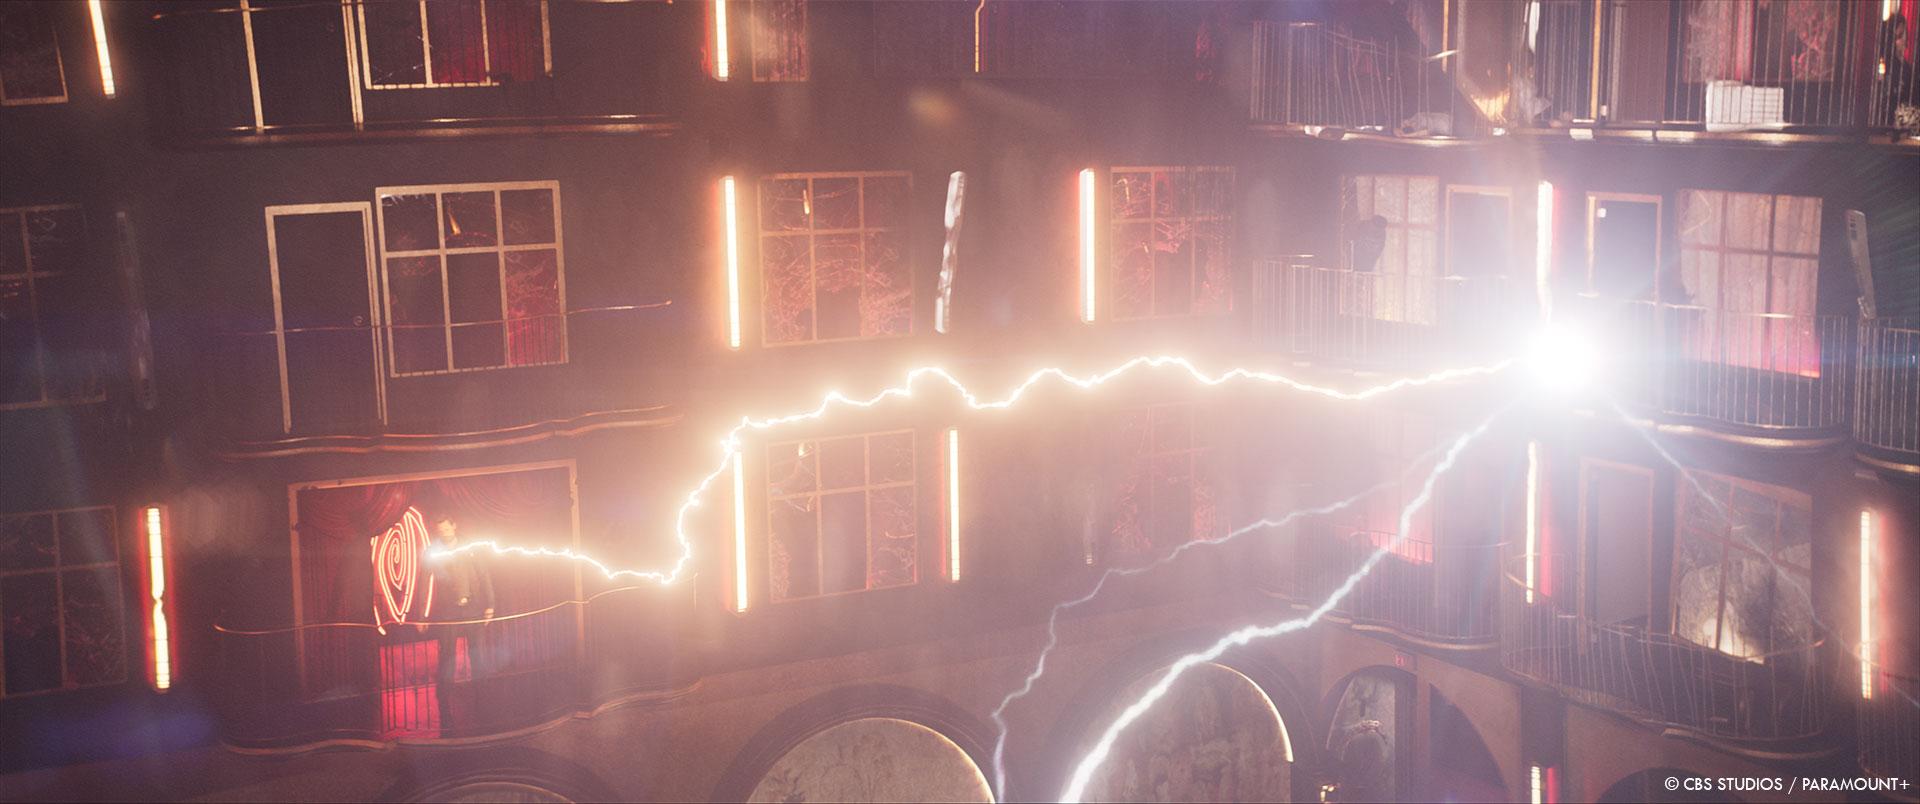 TheStand_ILM_Lightning.01B